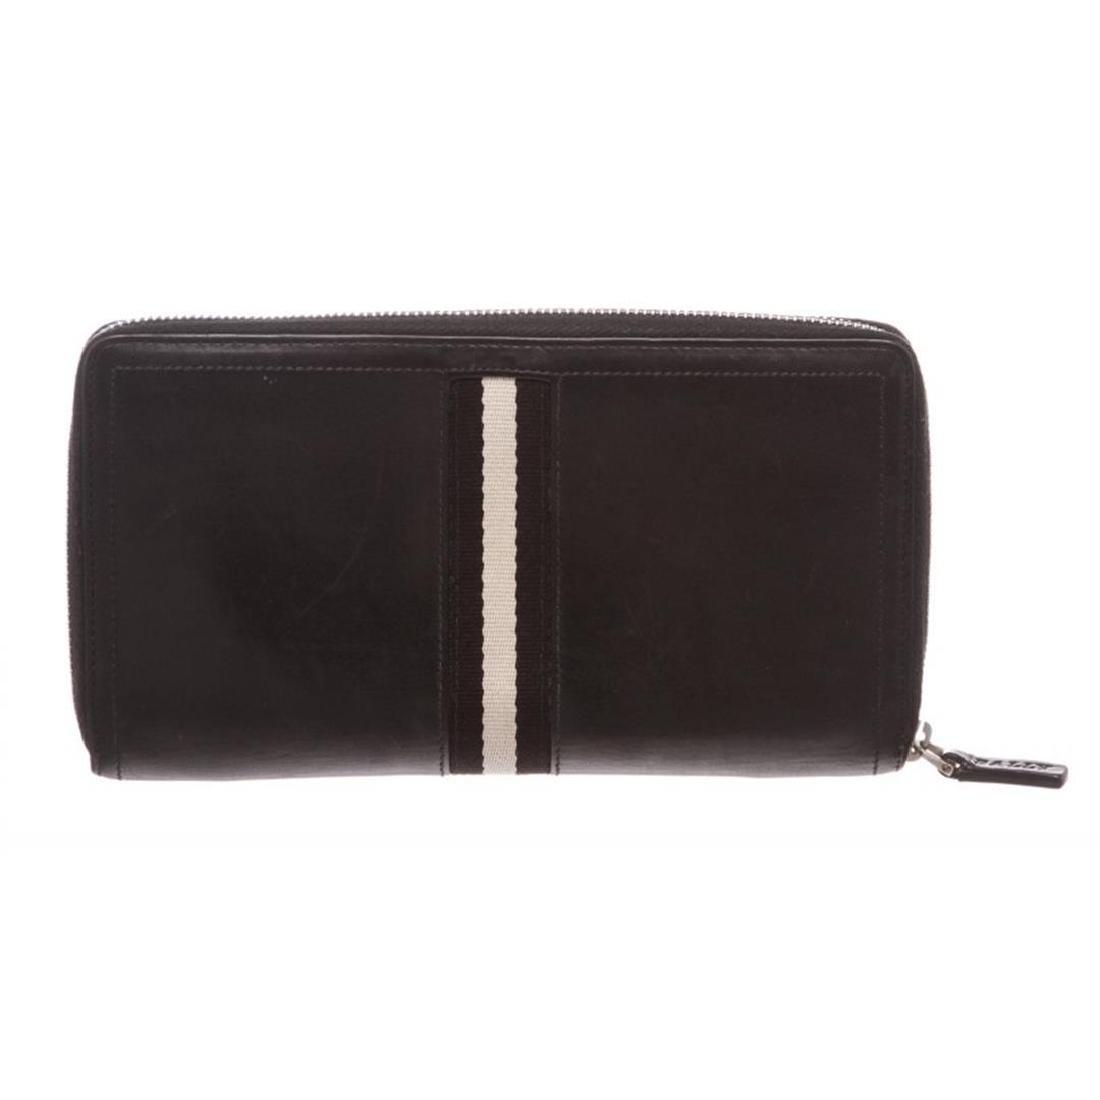 Bally Black Leather Long Zipper Wallet